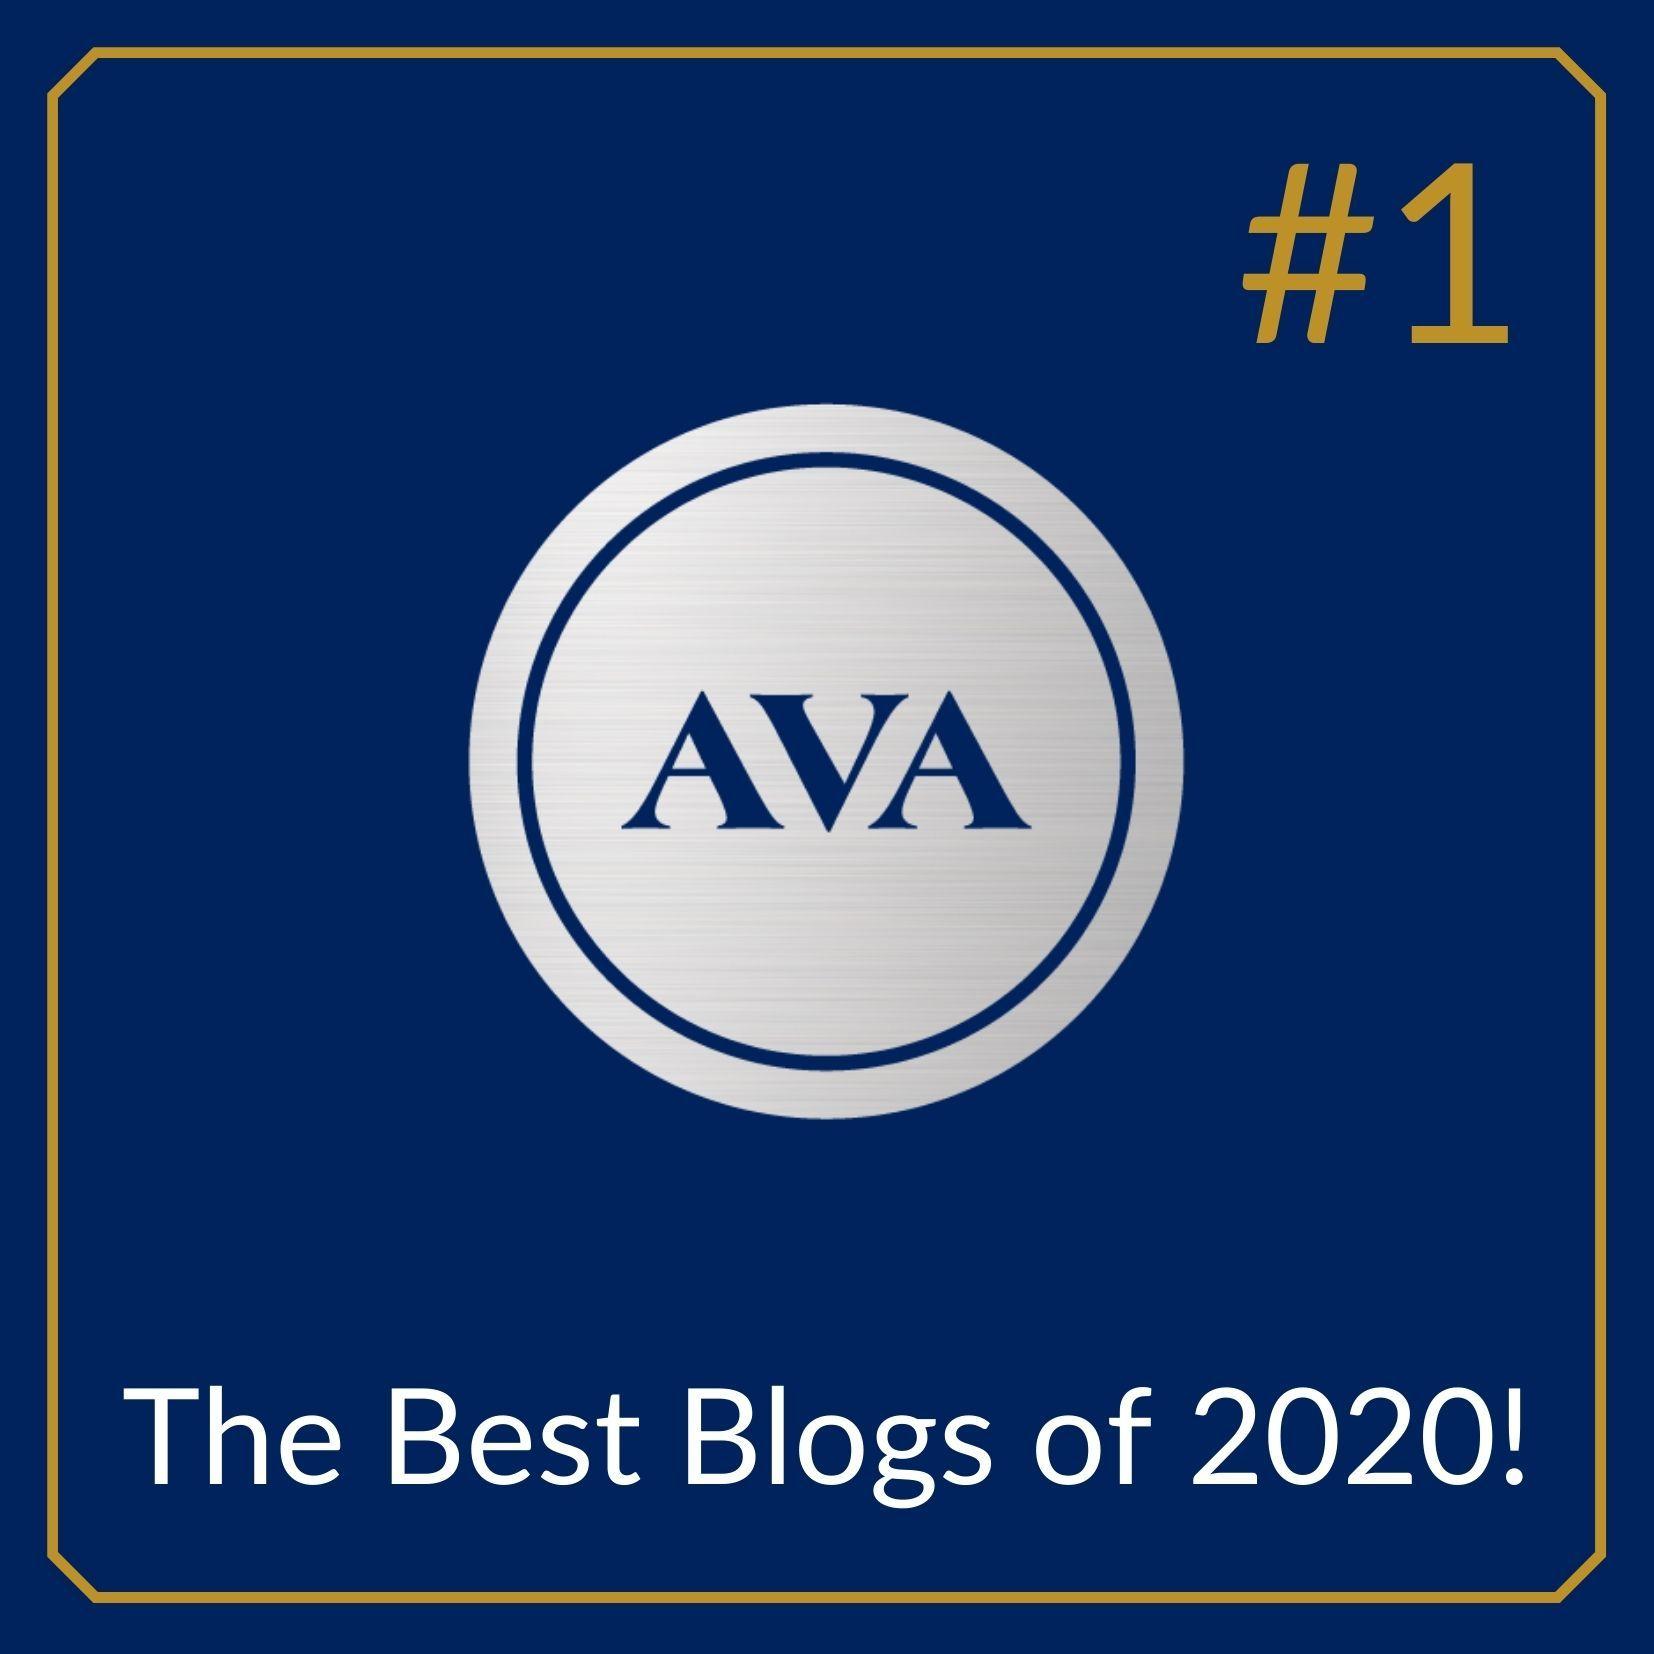 Best Blog #1